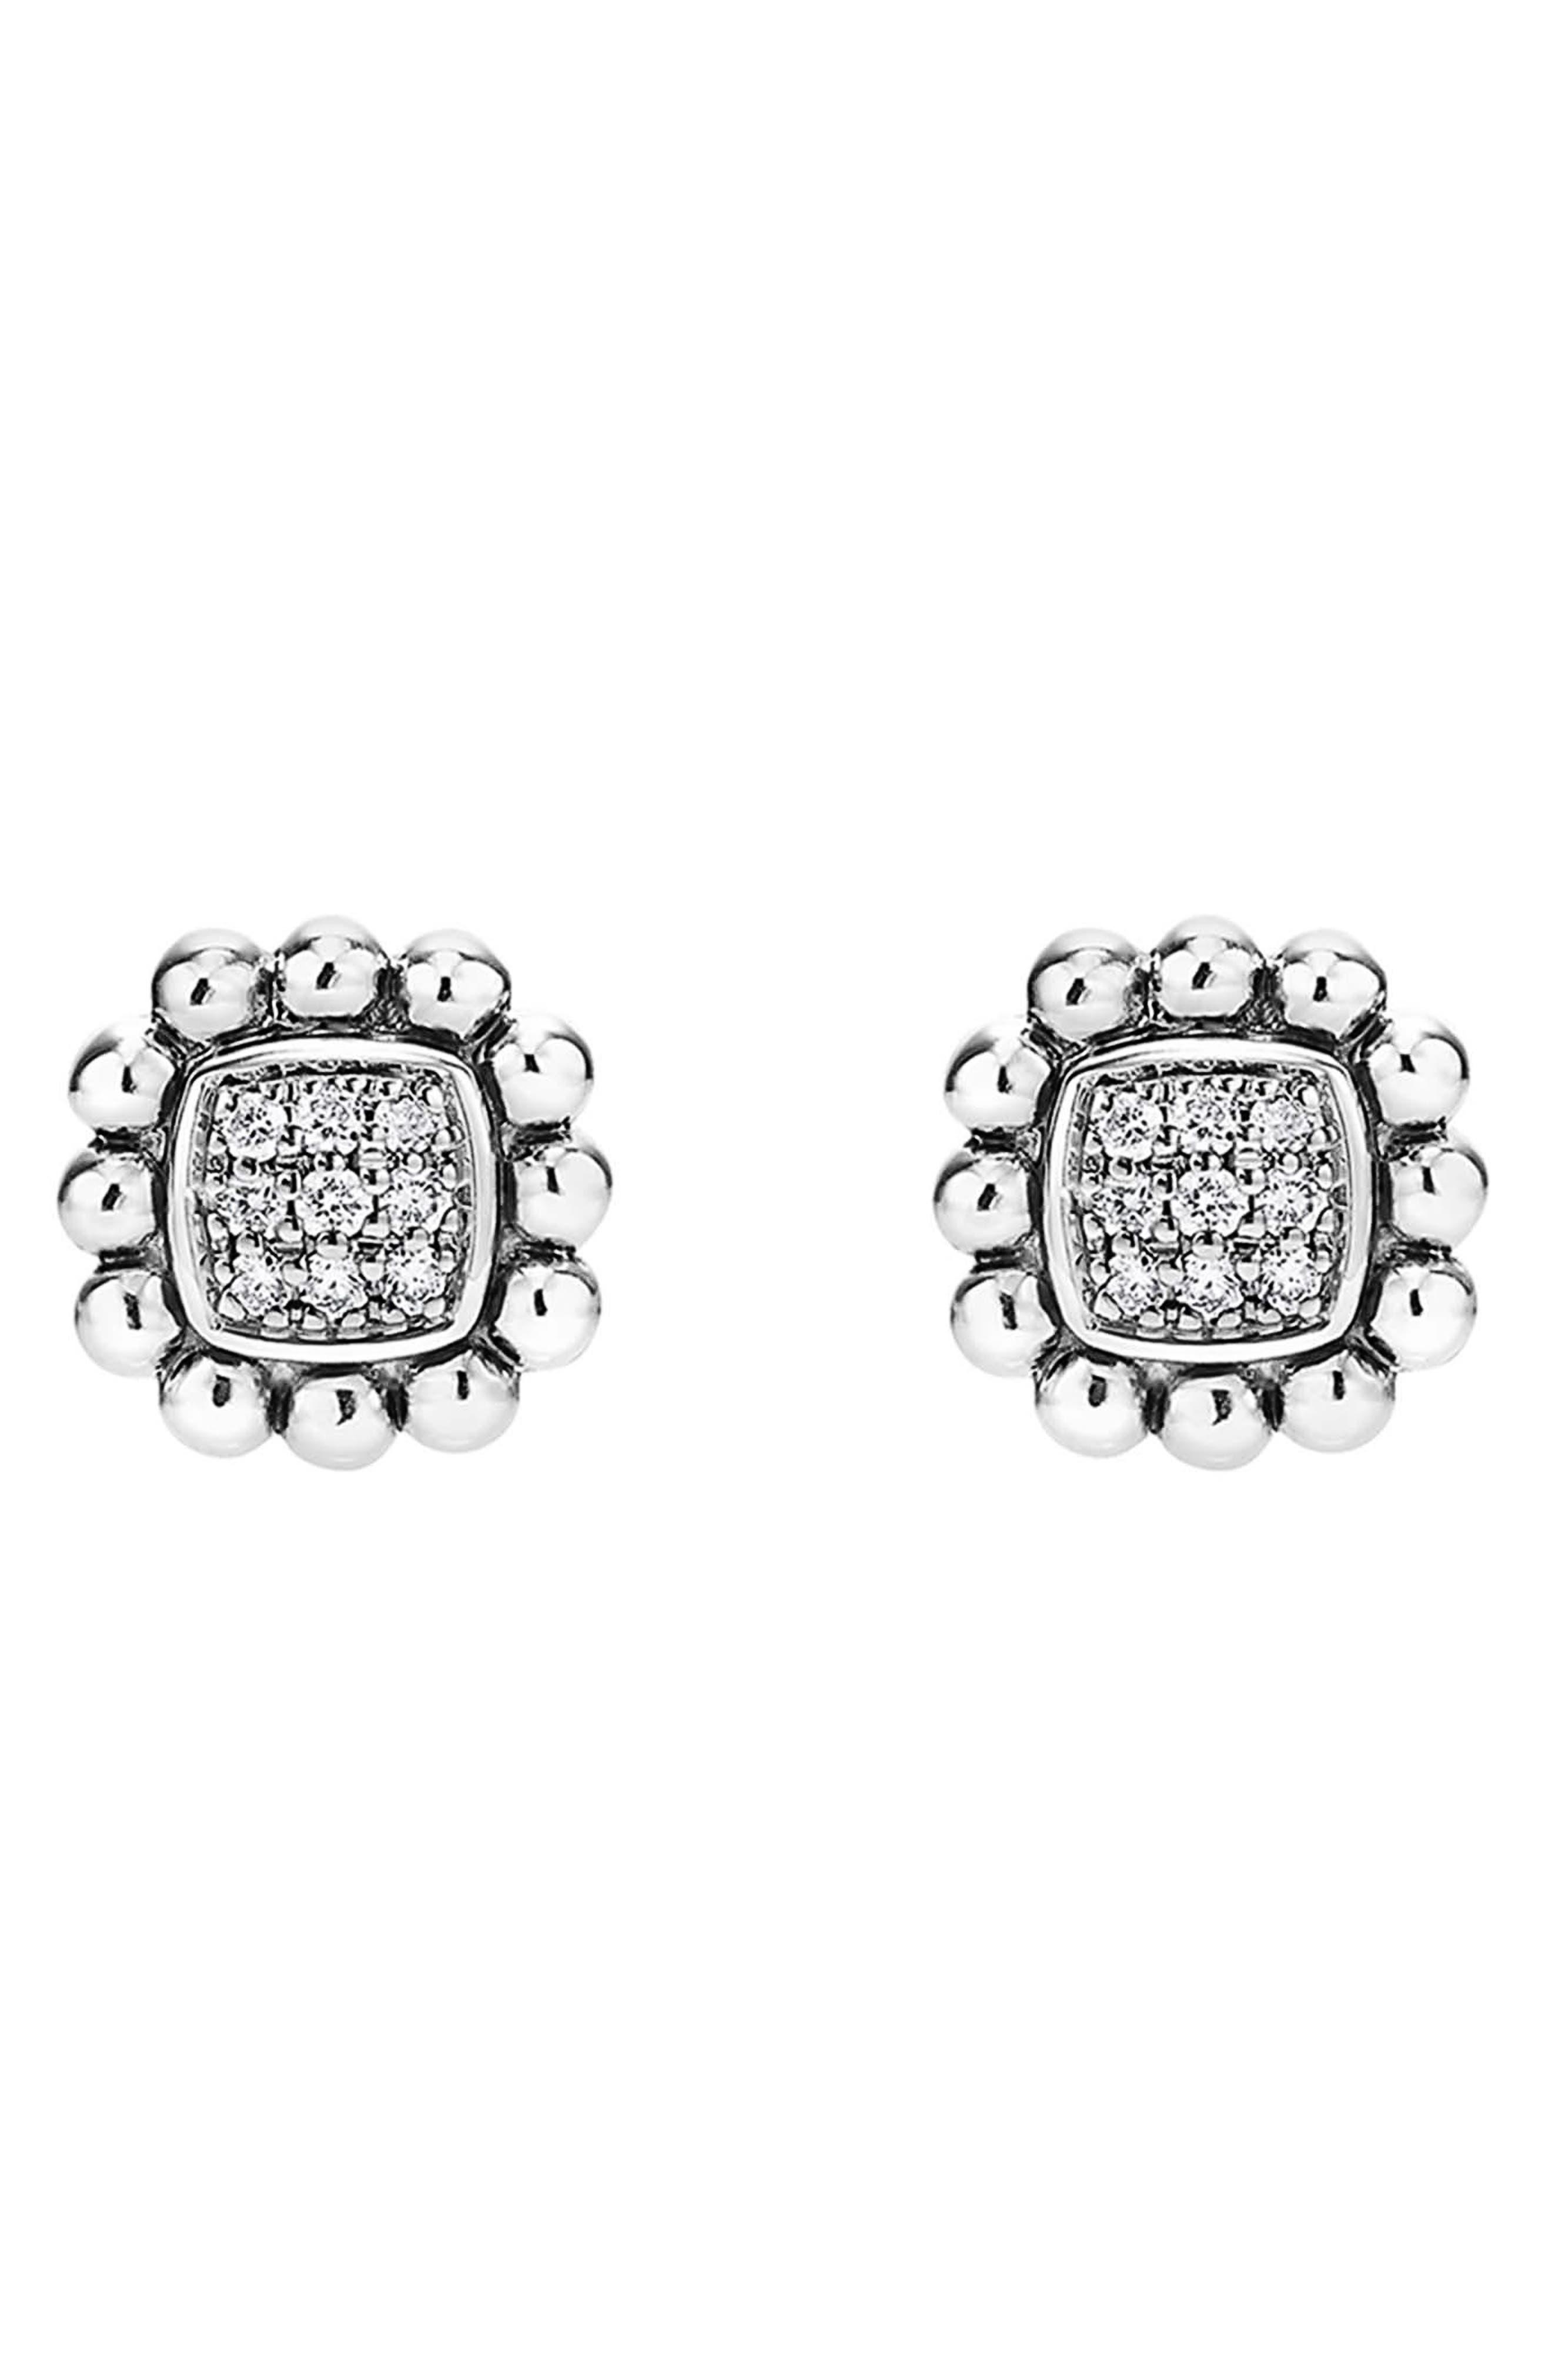 Caviar Spark Diamond Square Stud Earrings,                             Alternate thumbnail 2, color,                             SILVER/ DIAMOND